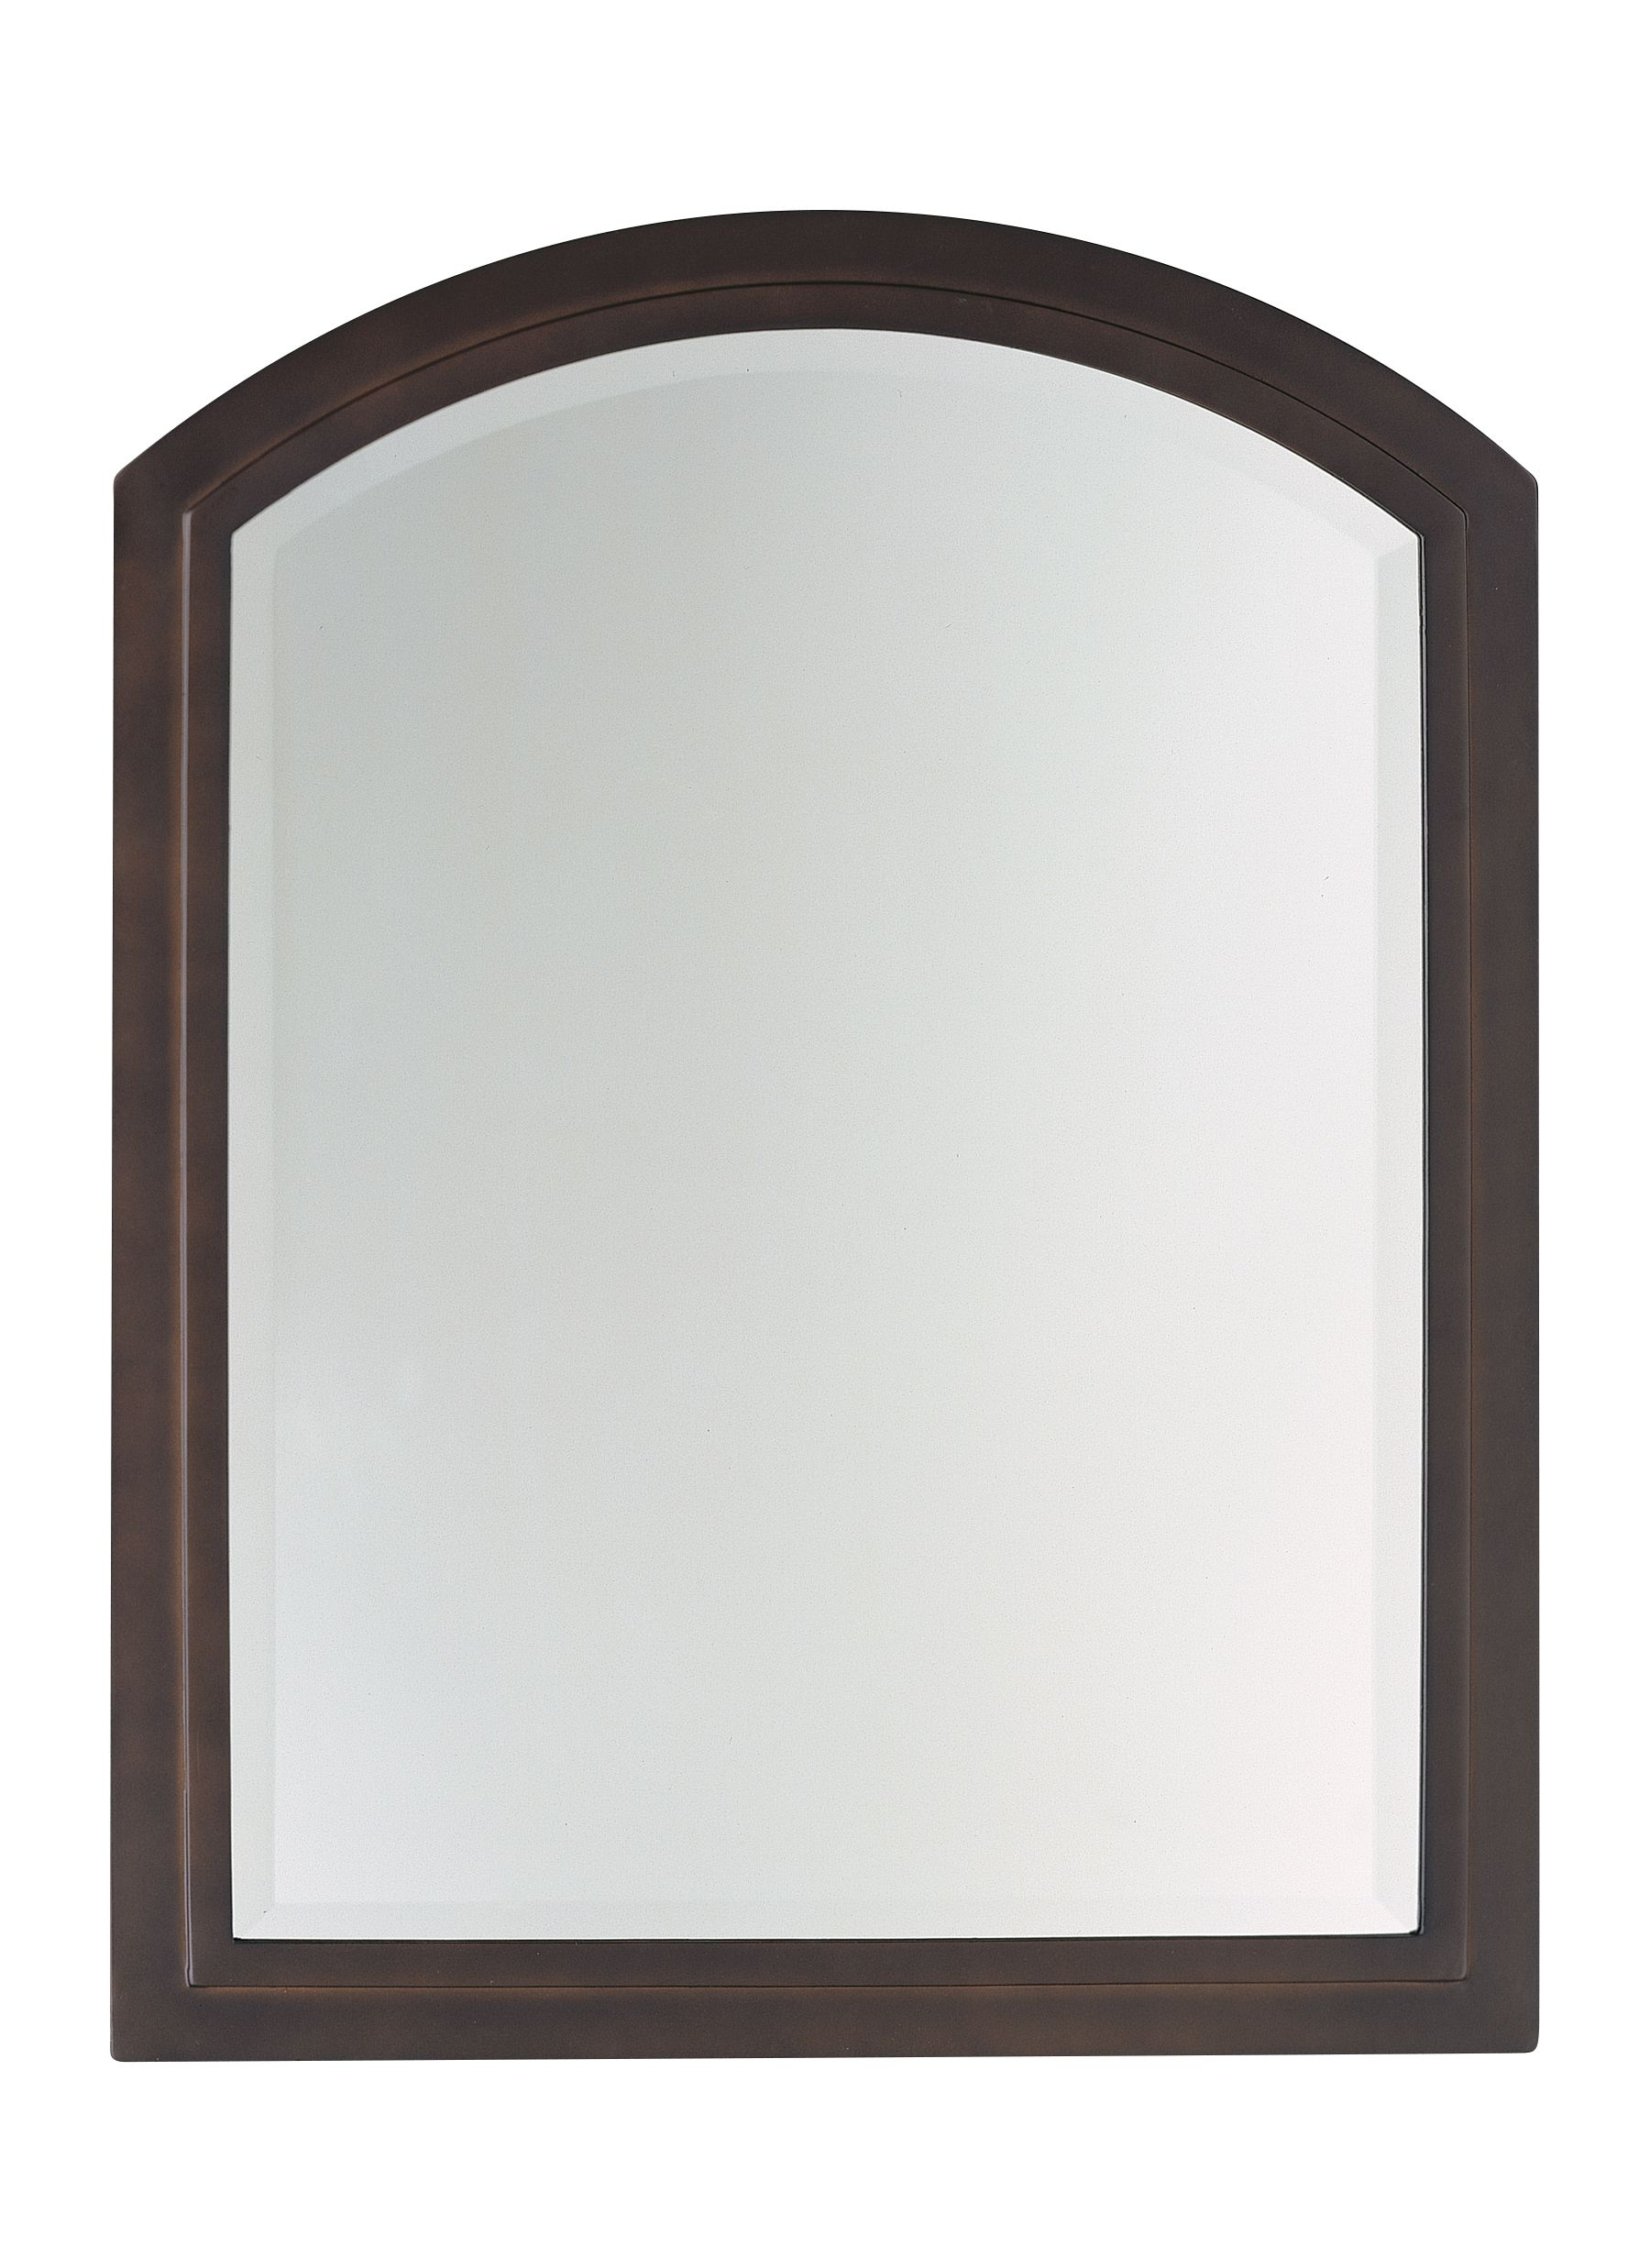 vanity mirror info wall conair frame bronze rubbed mounted pszczelawola oil bathroom mirrors